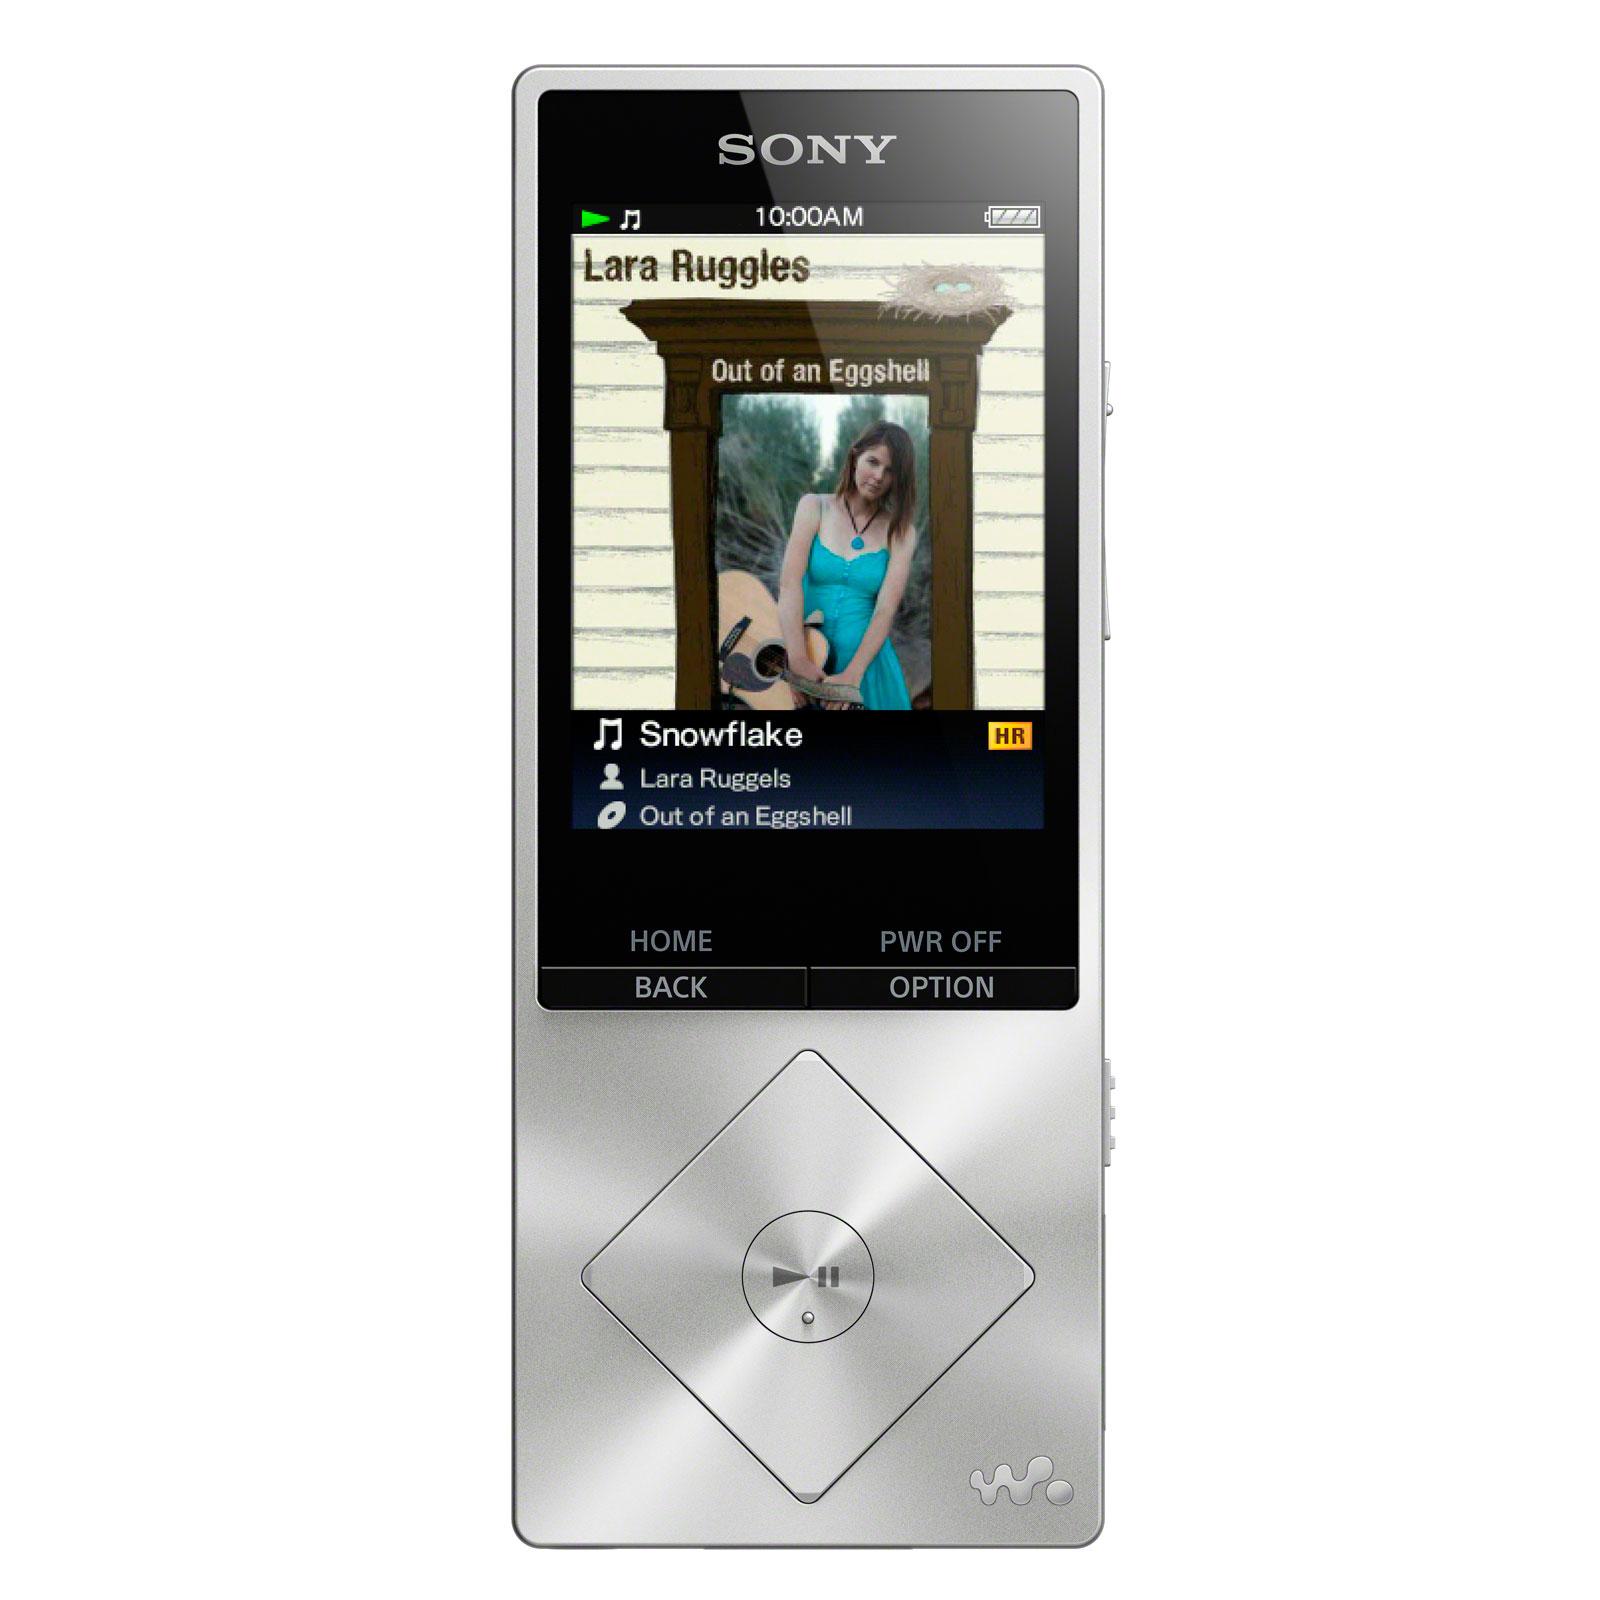 sony nwz a15s argent lecteur mp3 ipod sony sur ldlc. Black Bedroom Furniture Sets. Home Design Ideas